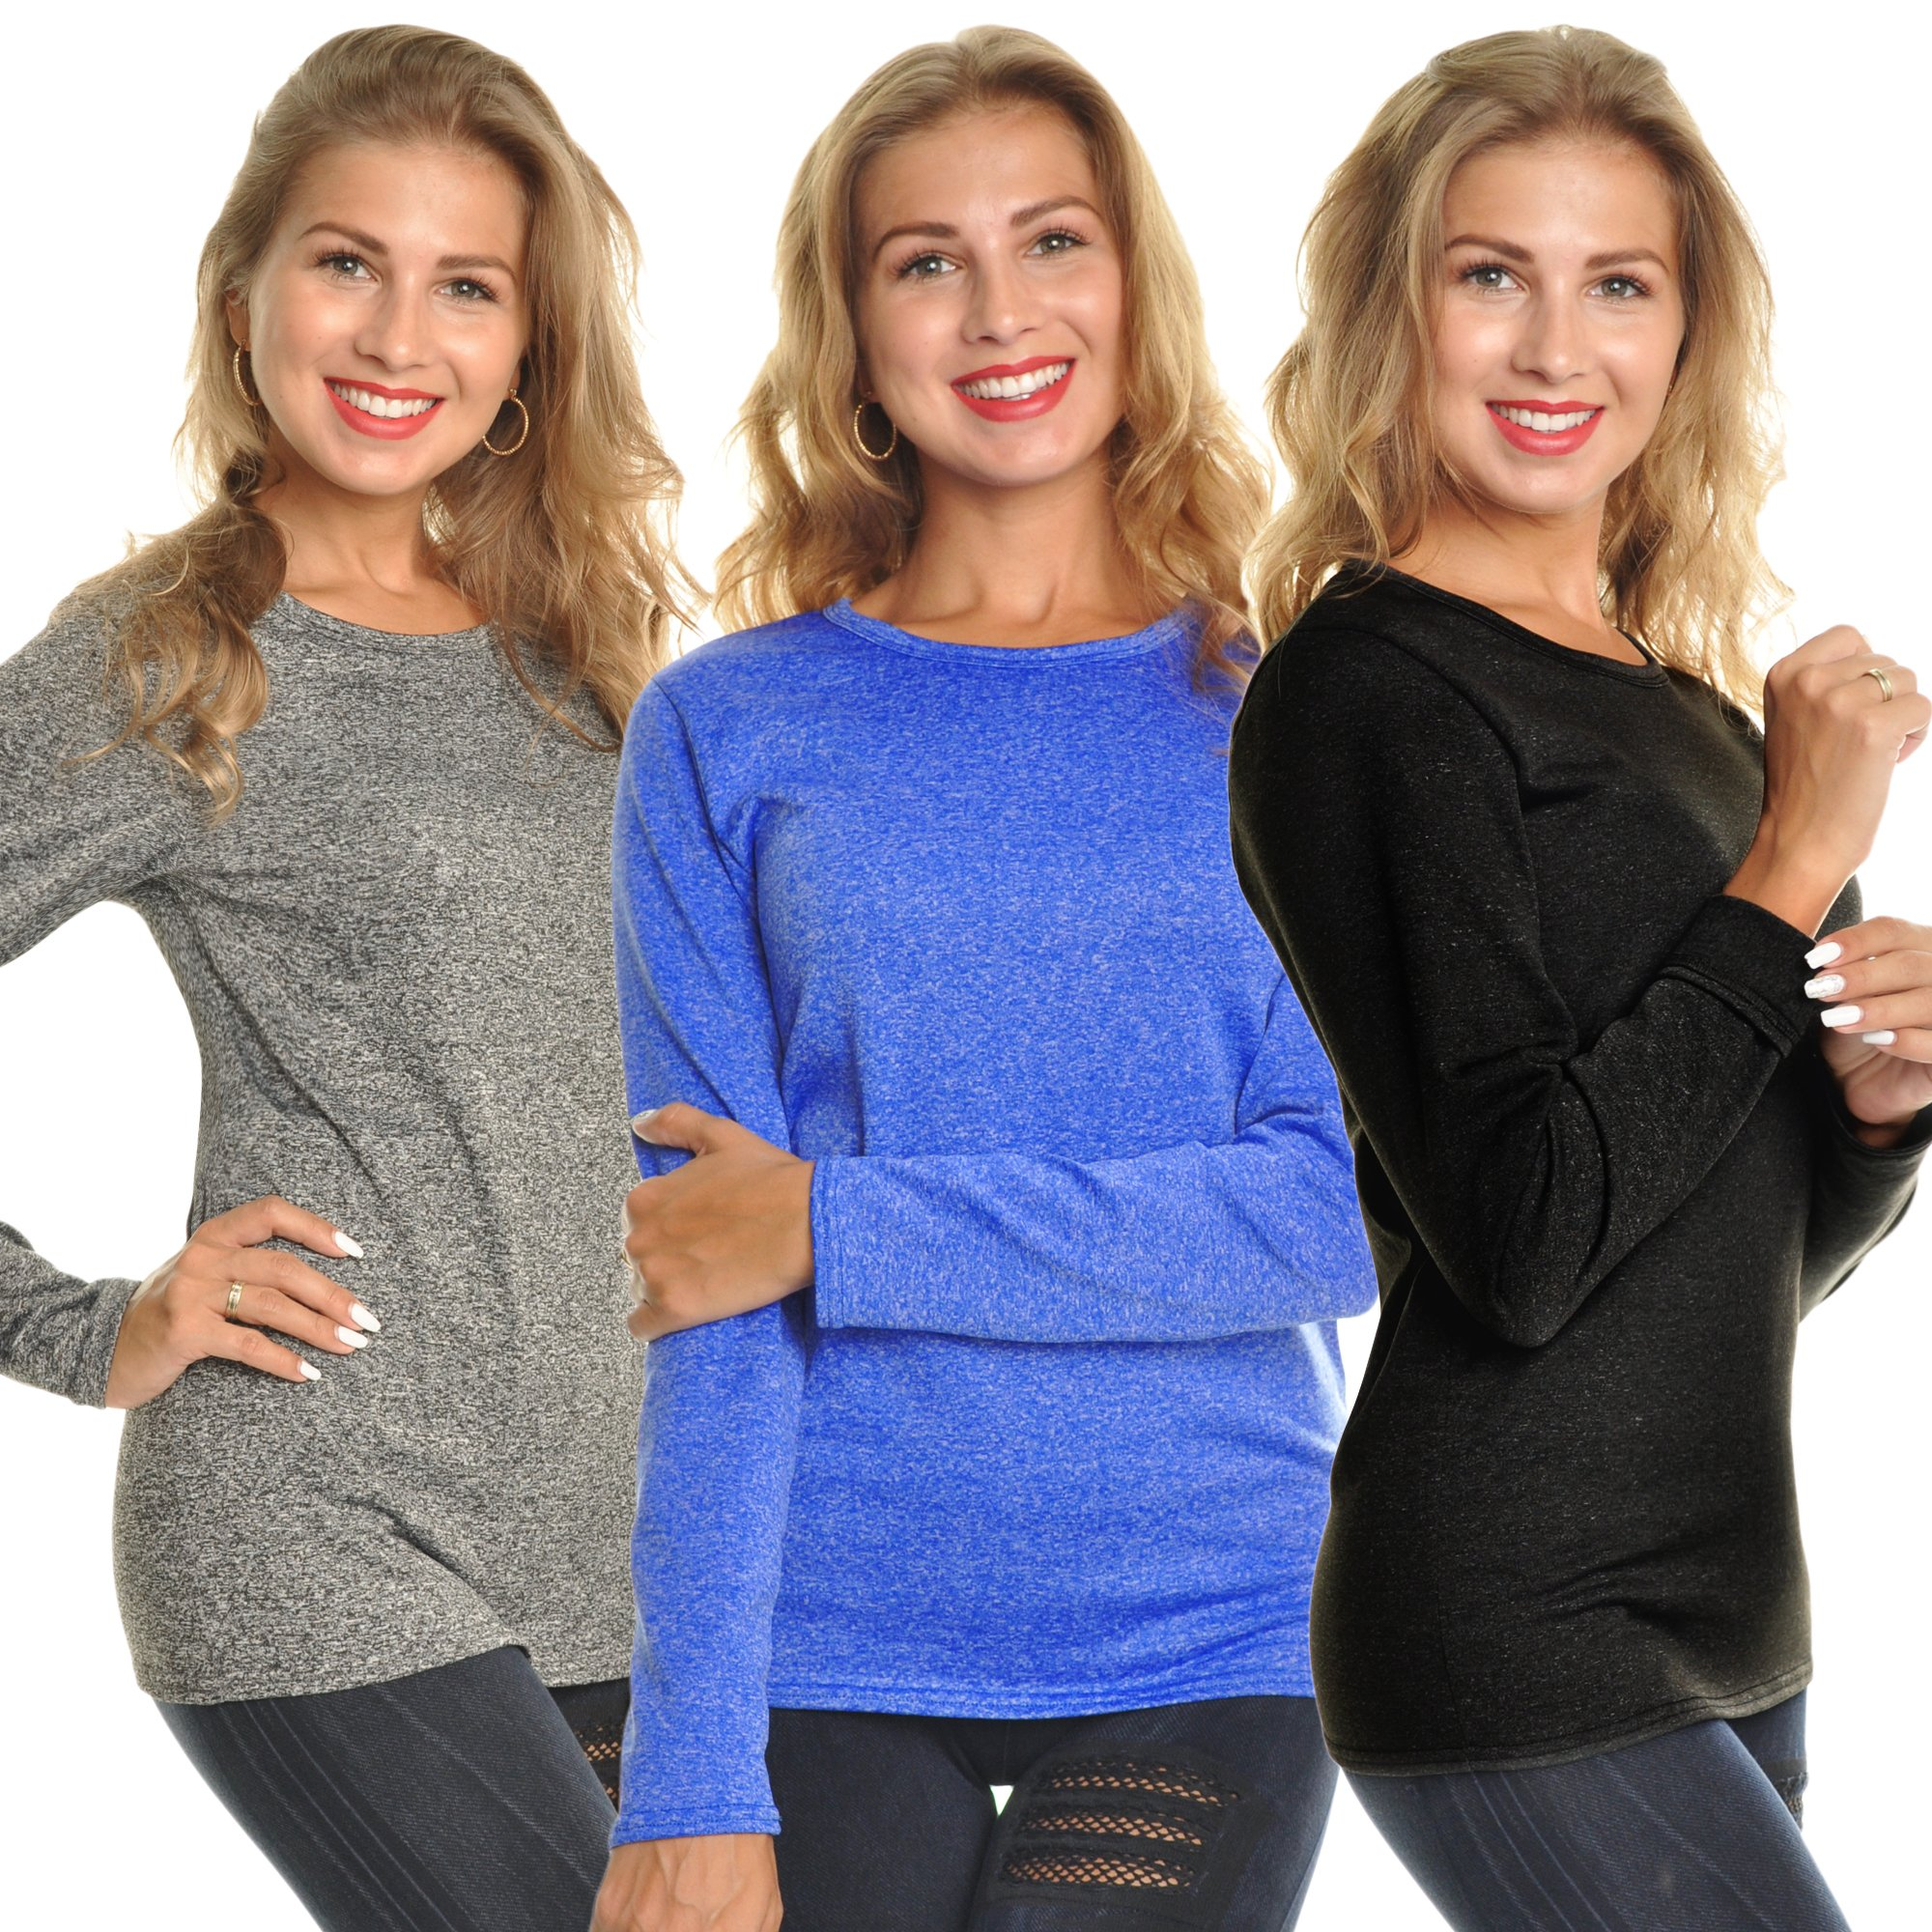 Angelina Women's Fleece Lined Long Sleeve Thermal Top,Marled,Medium (Pack 3)